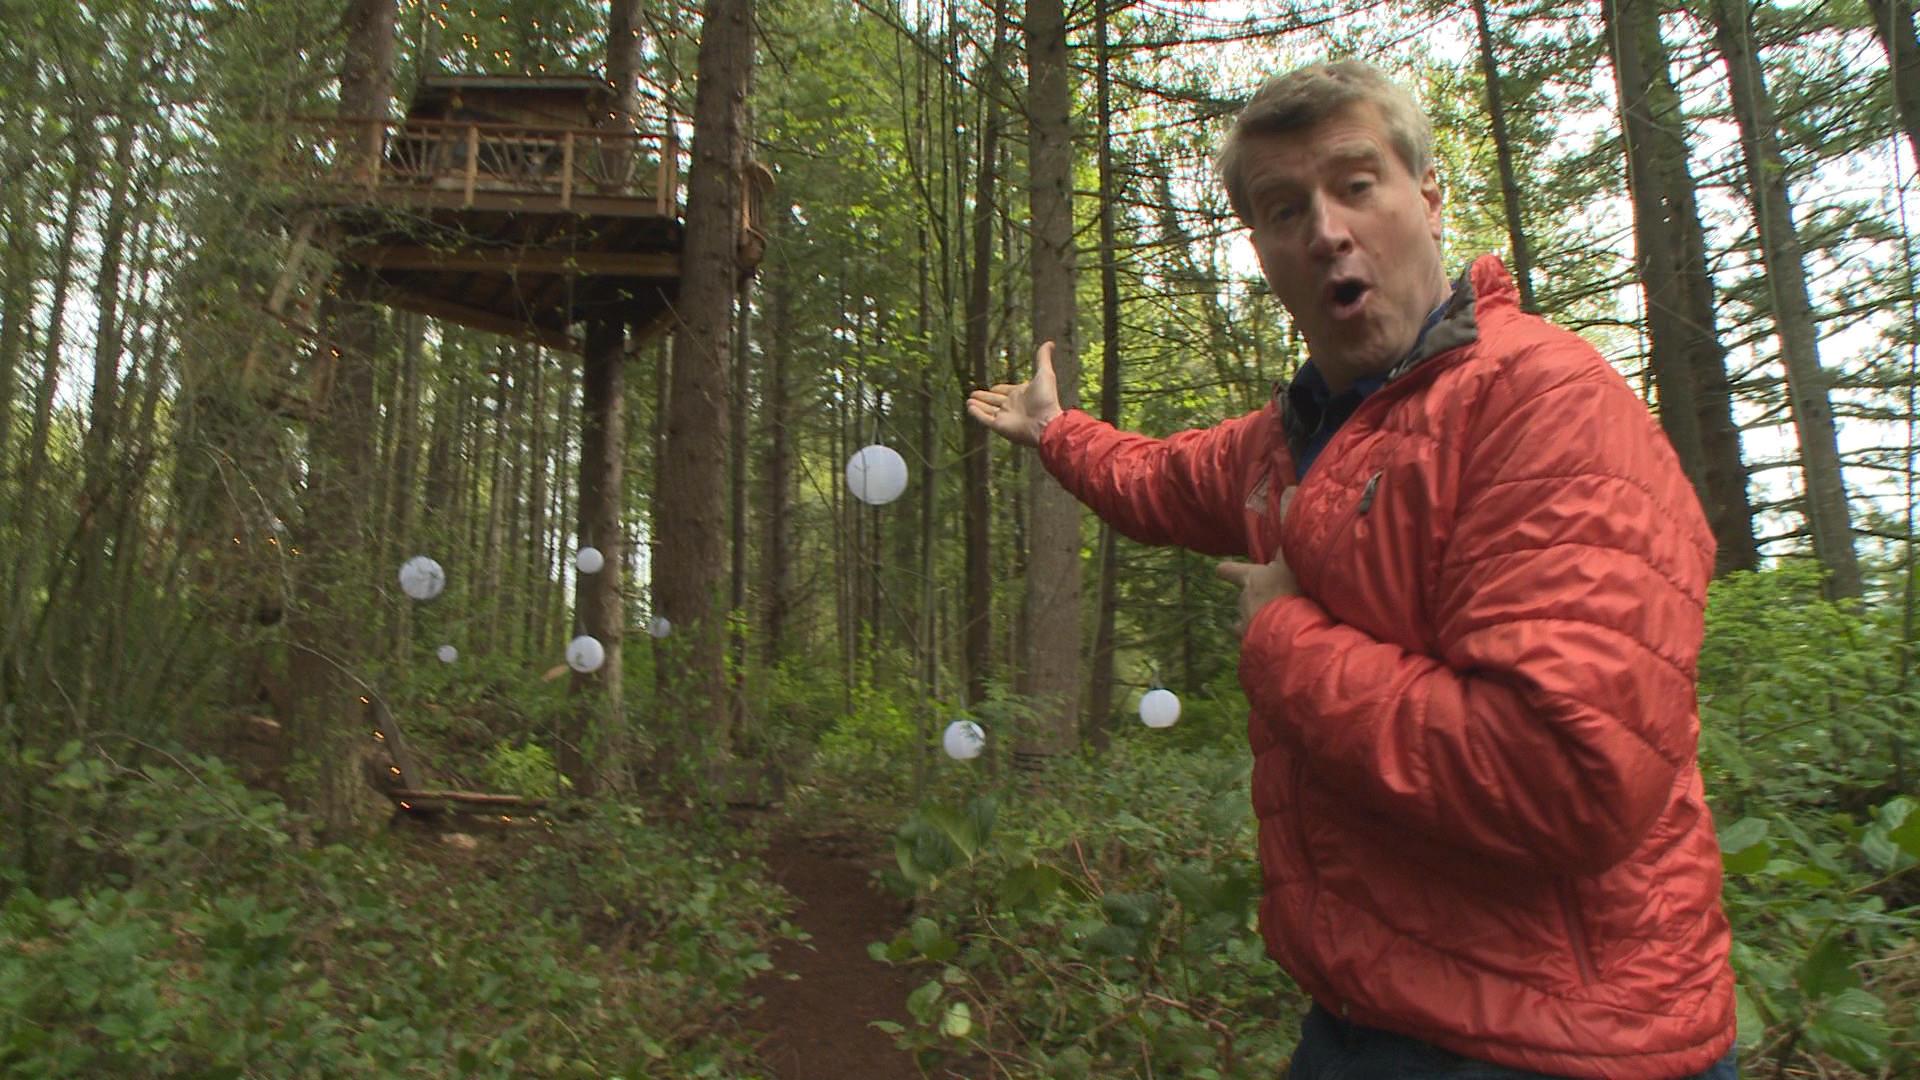 Alex meyer treehouse masters age - Alex Meyer Treehouse Masters Nelson Treehouse Charming Pete Spitalerhof On Decor